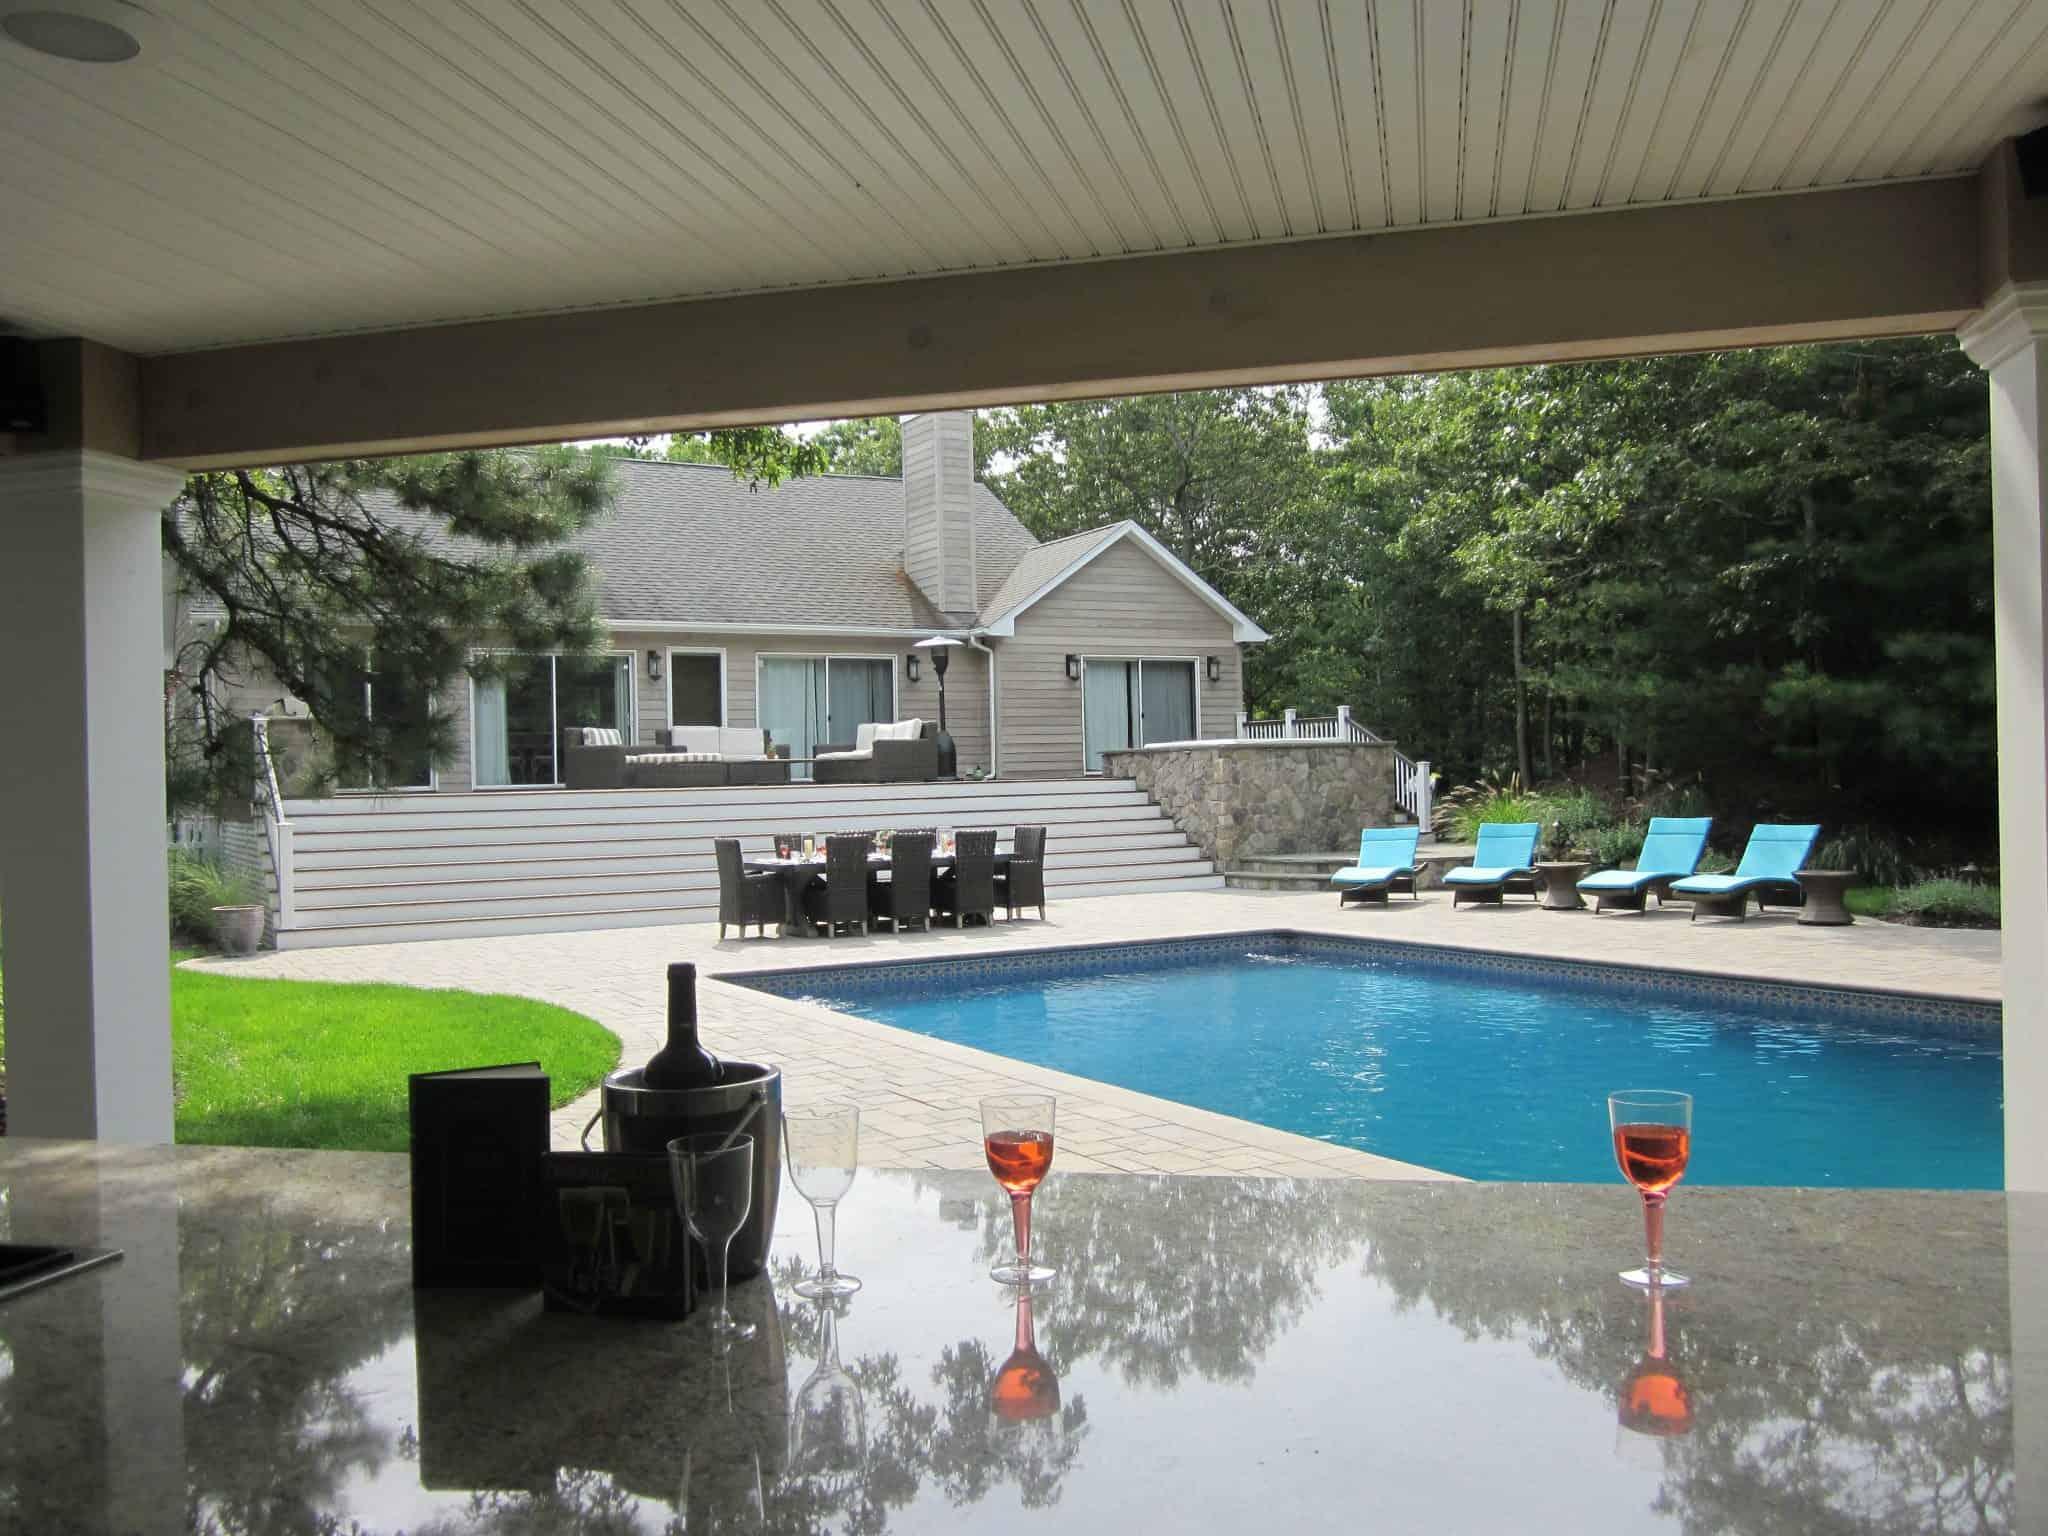 Outdoor bar and granite countertop veneered in Dressed Field Stone - Bucks County - Hampton Bays, Long Island NY